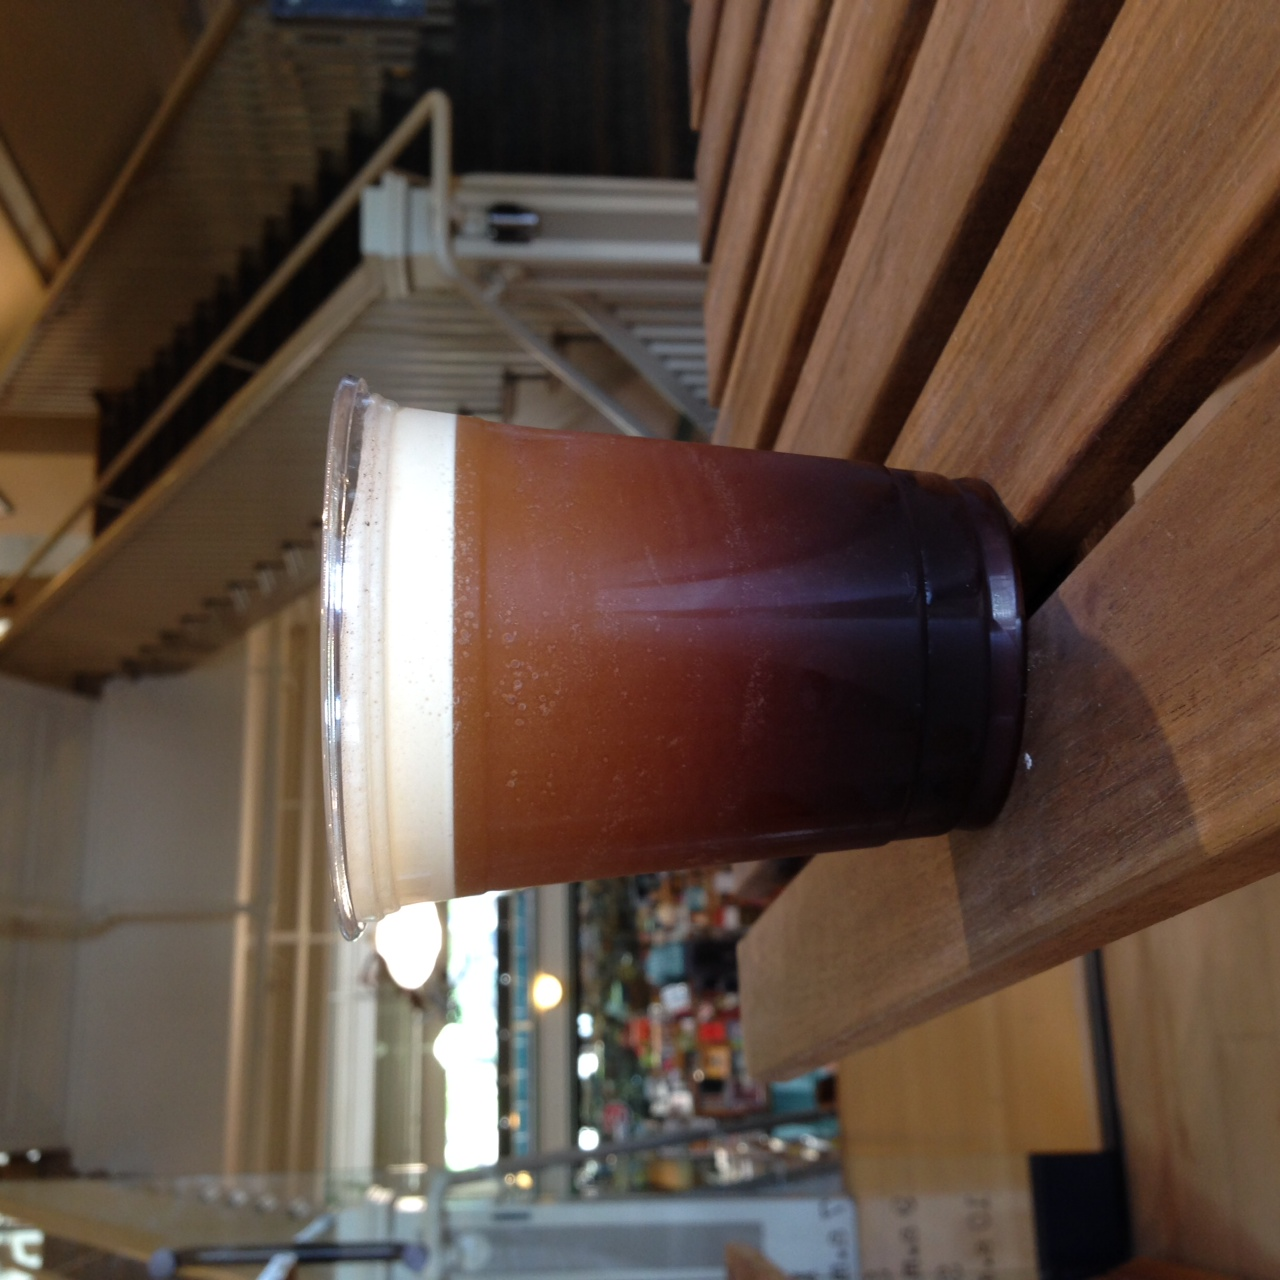 spokane-nitro-coffee-cold-brew-beautiful-grounds